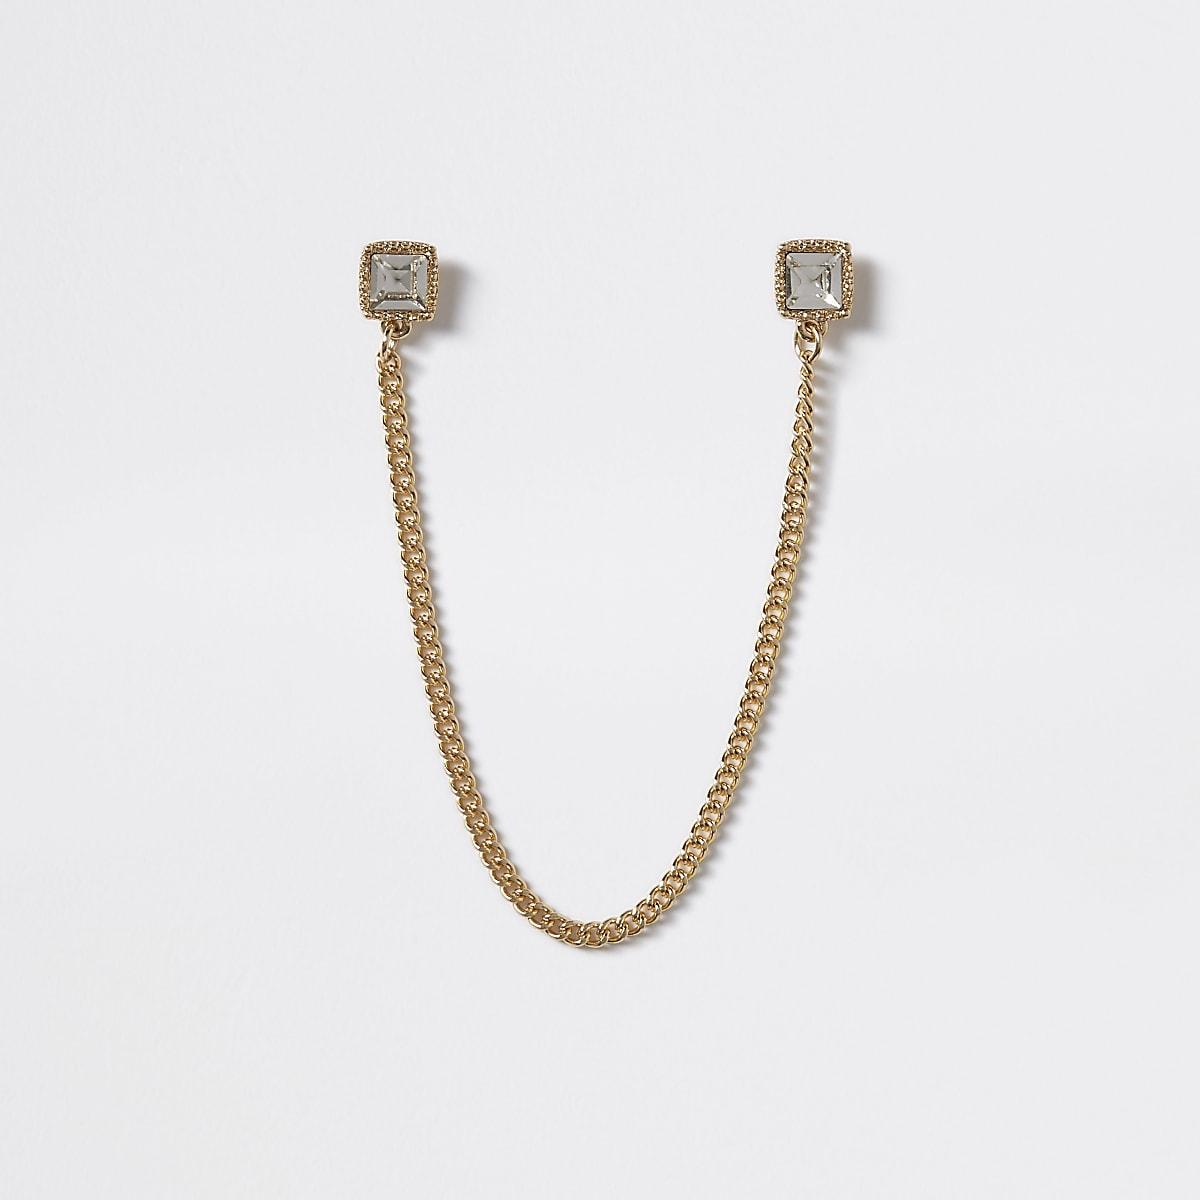 Gold tone cubic zirconia collar tips